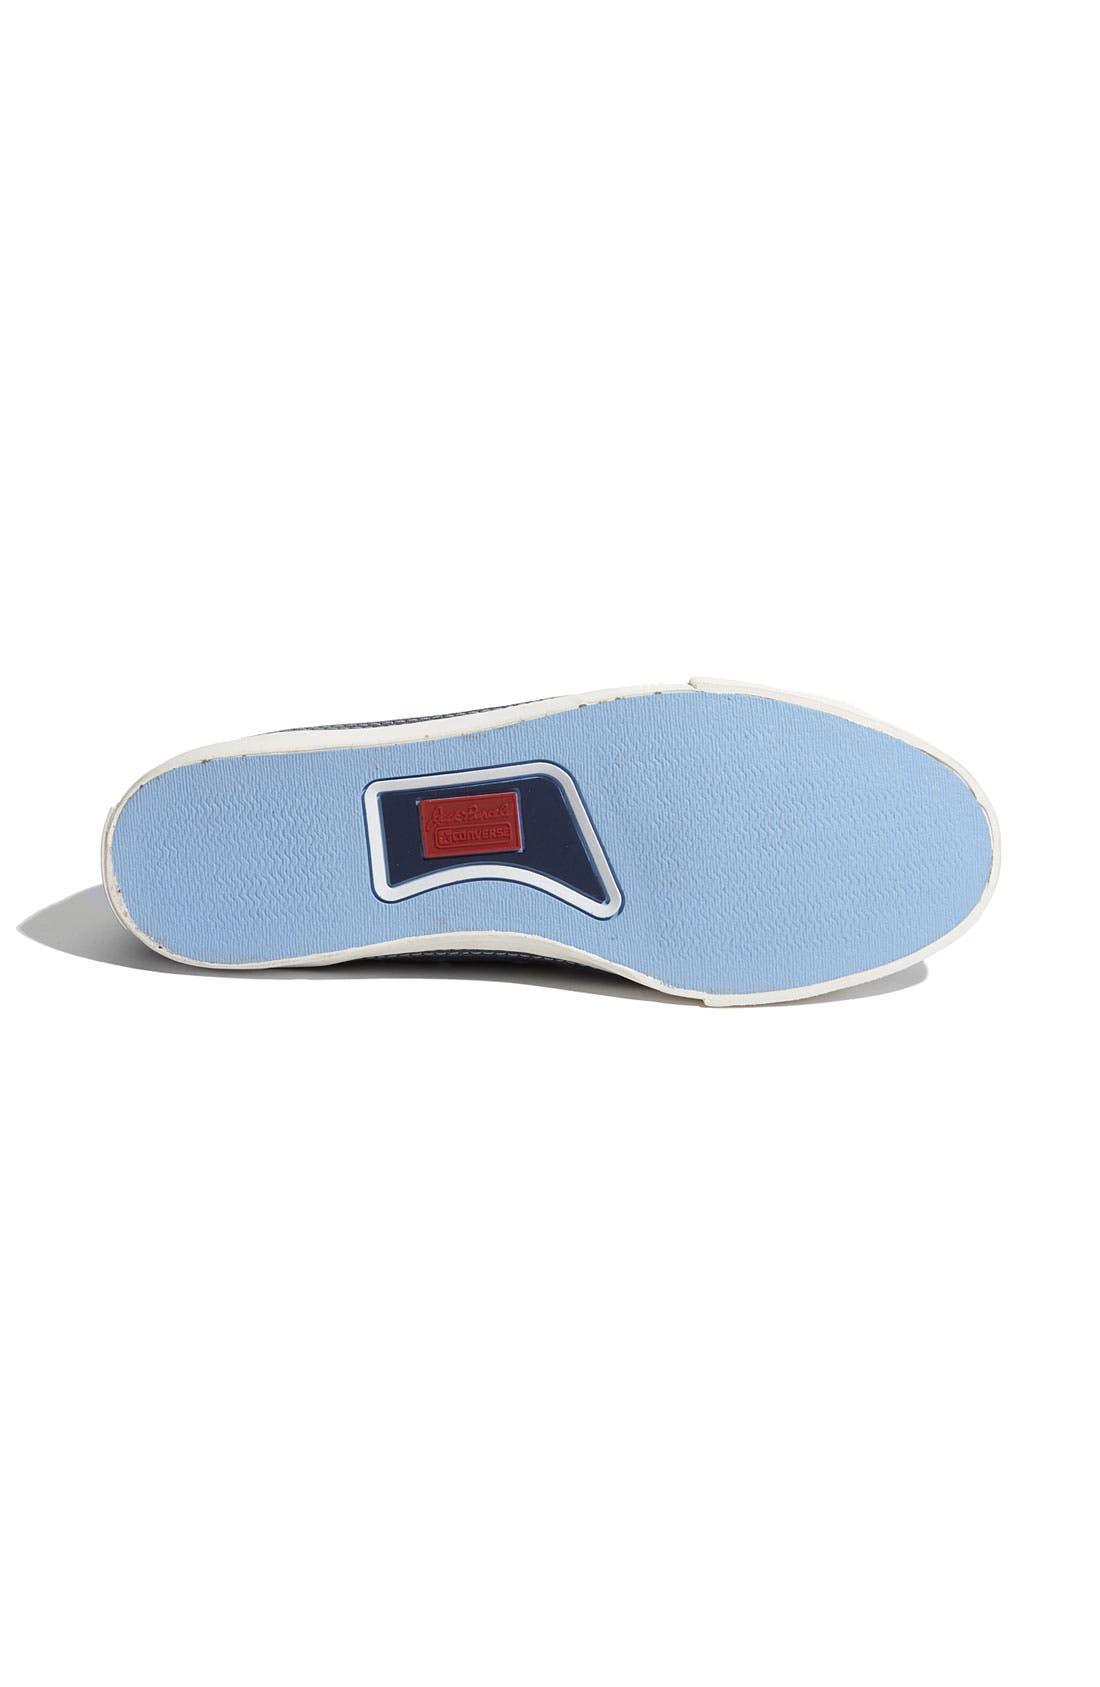 Alternate Image 4  - Converse 'Jack Purcell' Slip-On Sneaker (Women)